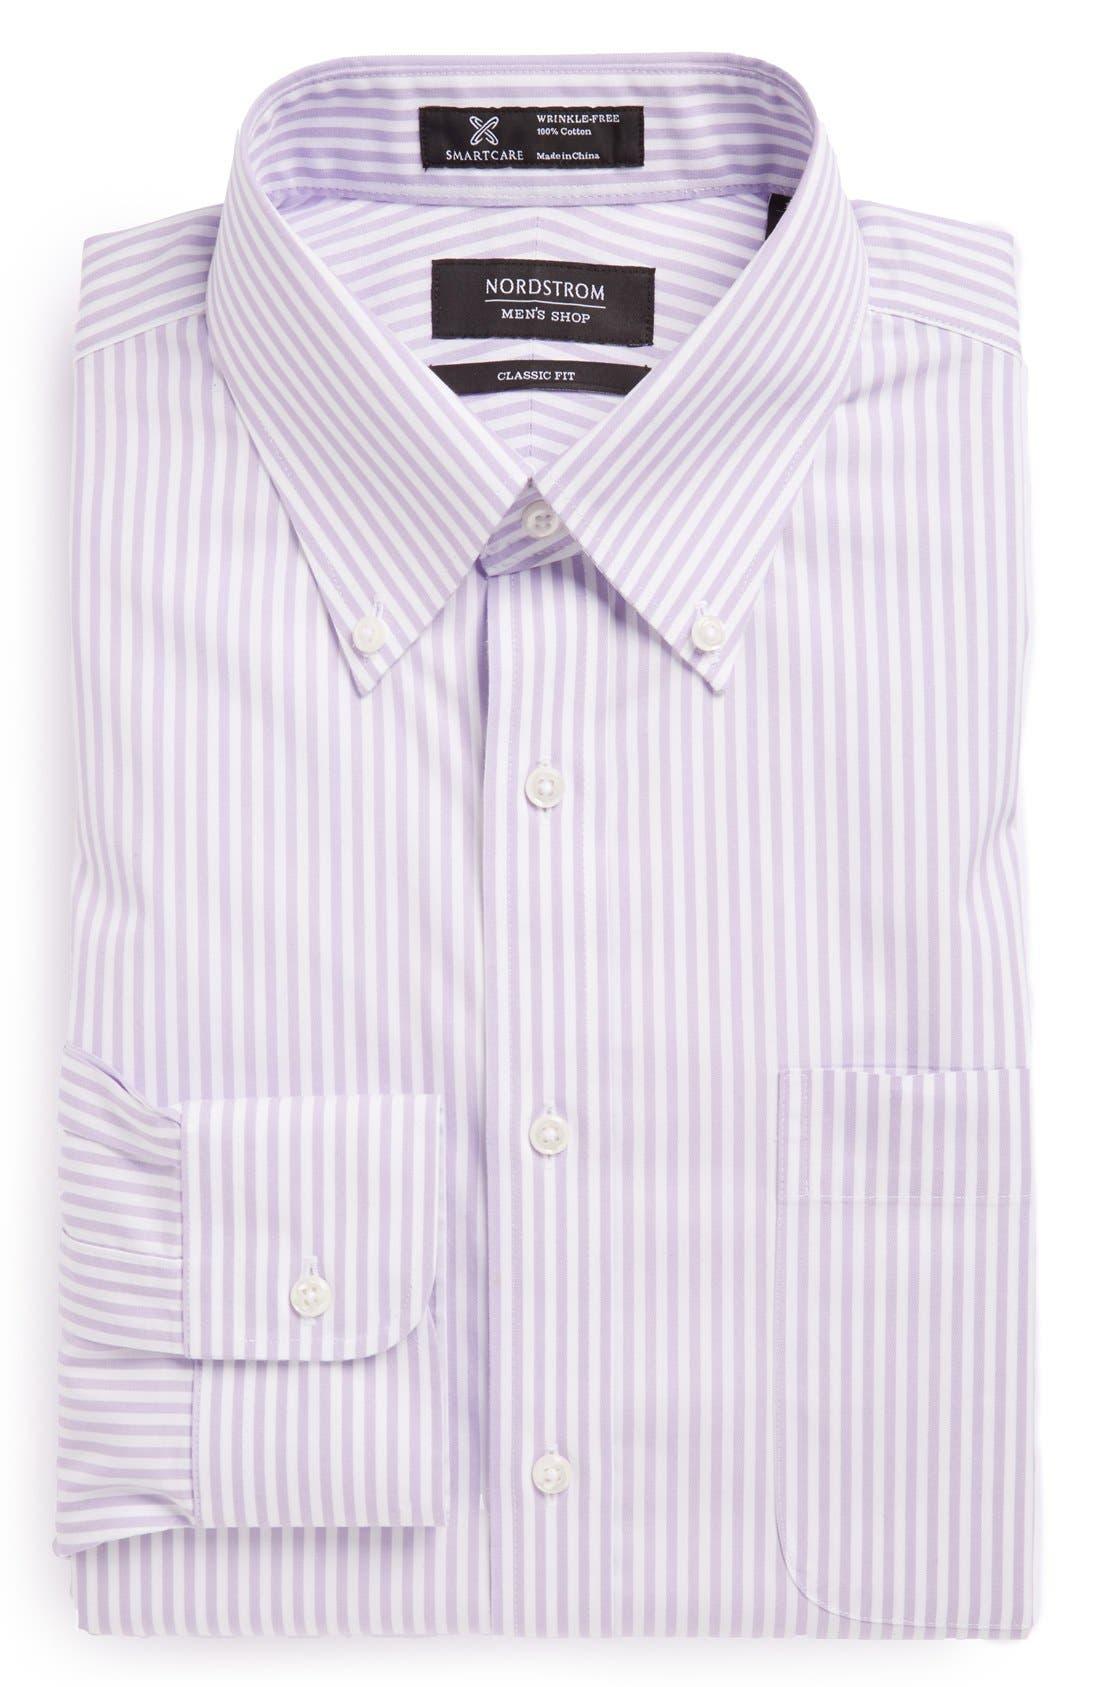 Alternate Image 1 Selected - Nordstrom Men's Shop Smartcare™ Classic Fit Stripe Dress Shirt (Online Only)